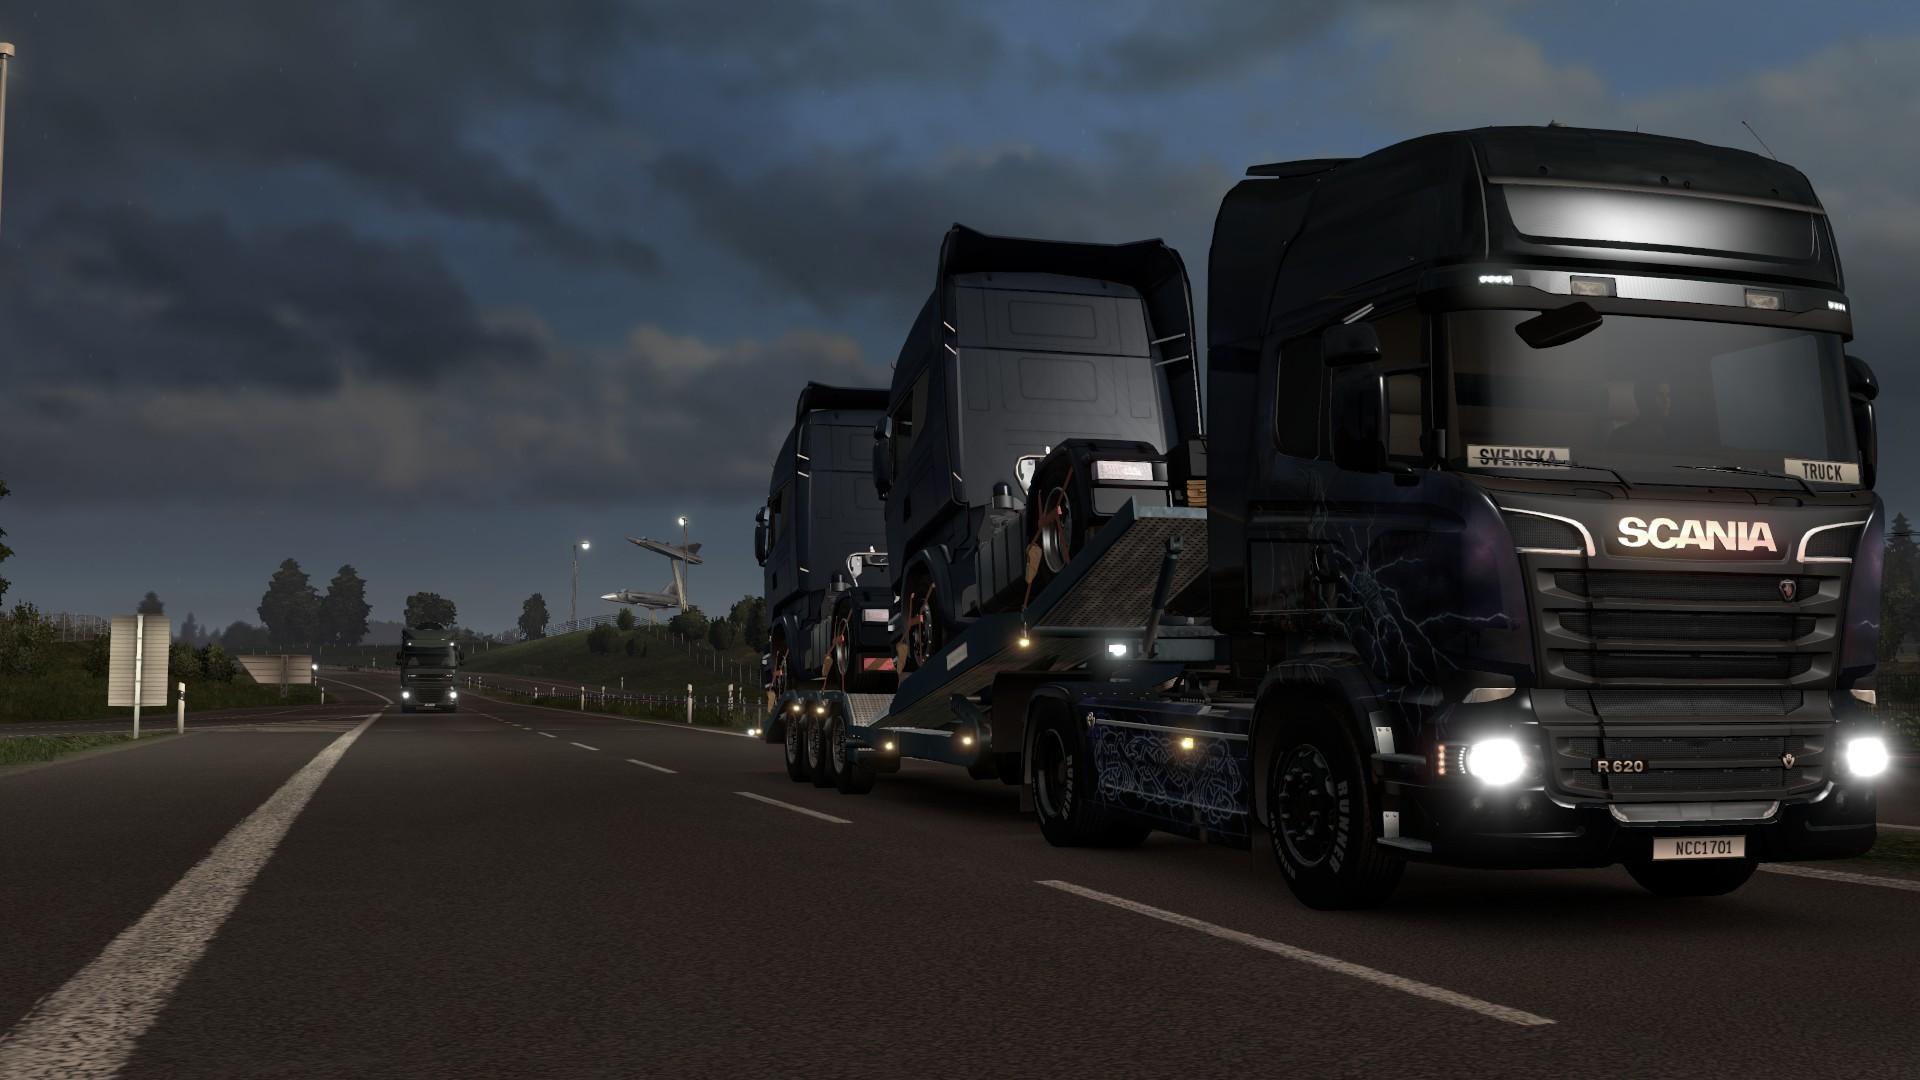 Truck Wallpapers High Resolution Wwwpicsbudcom